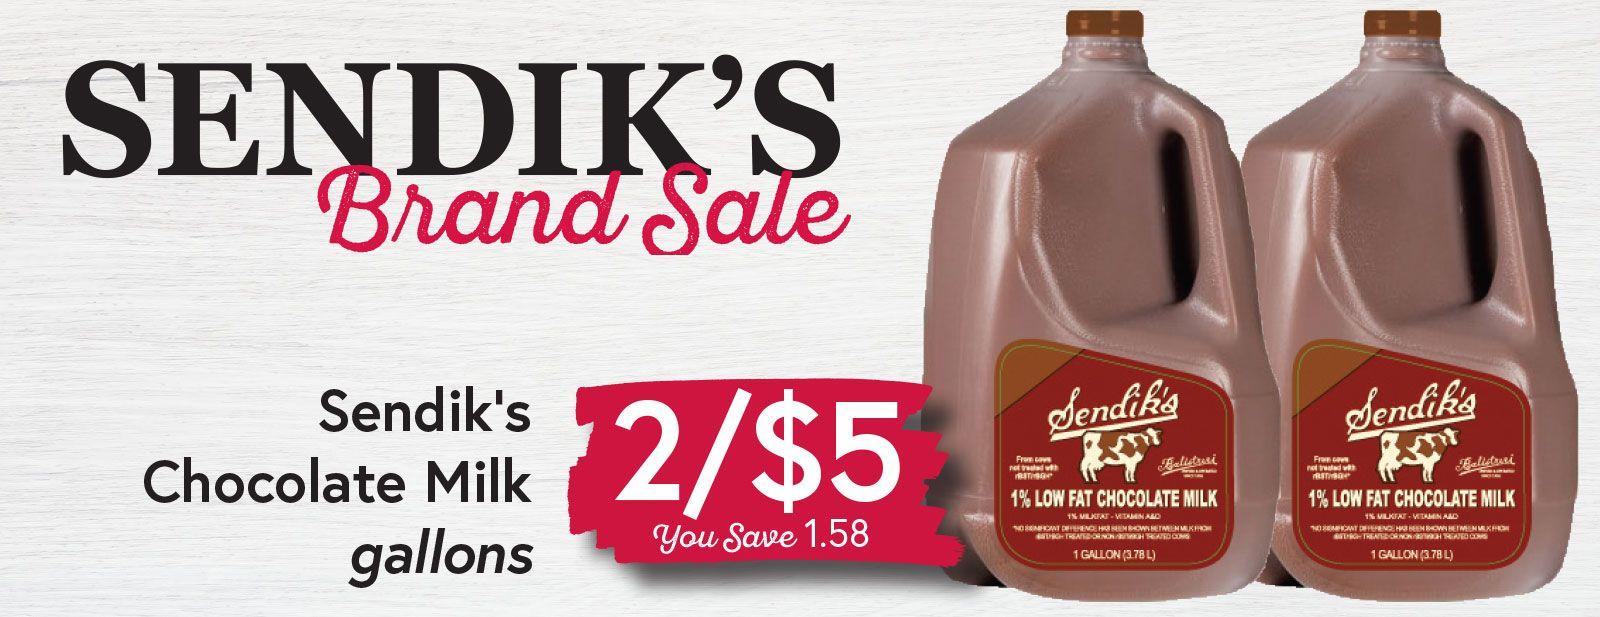 Sendik's Chocolate Milk Gallons 2/$5